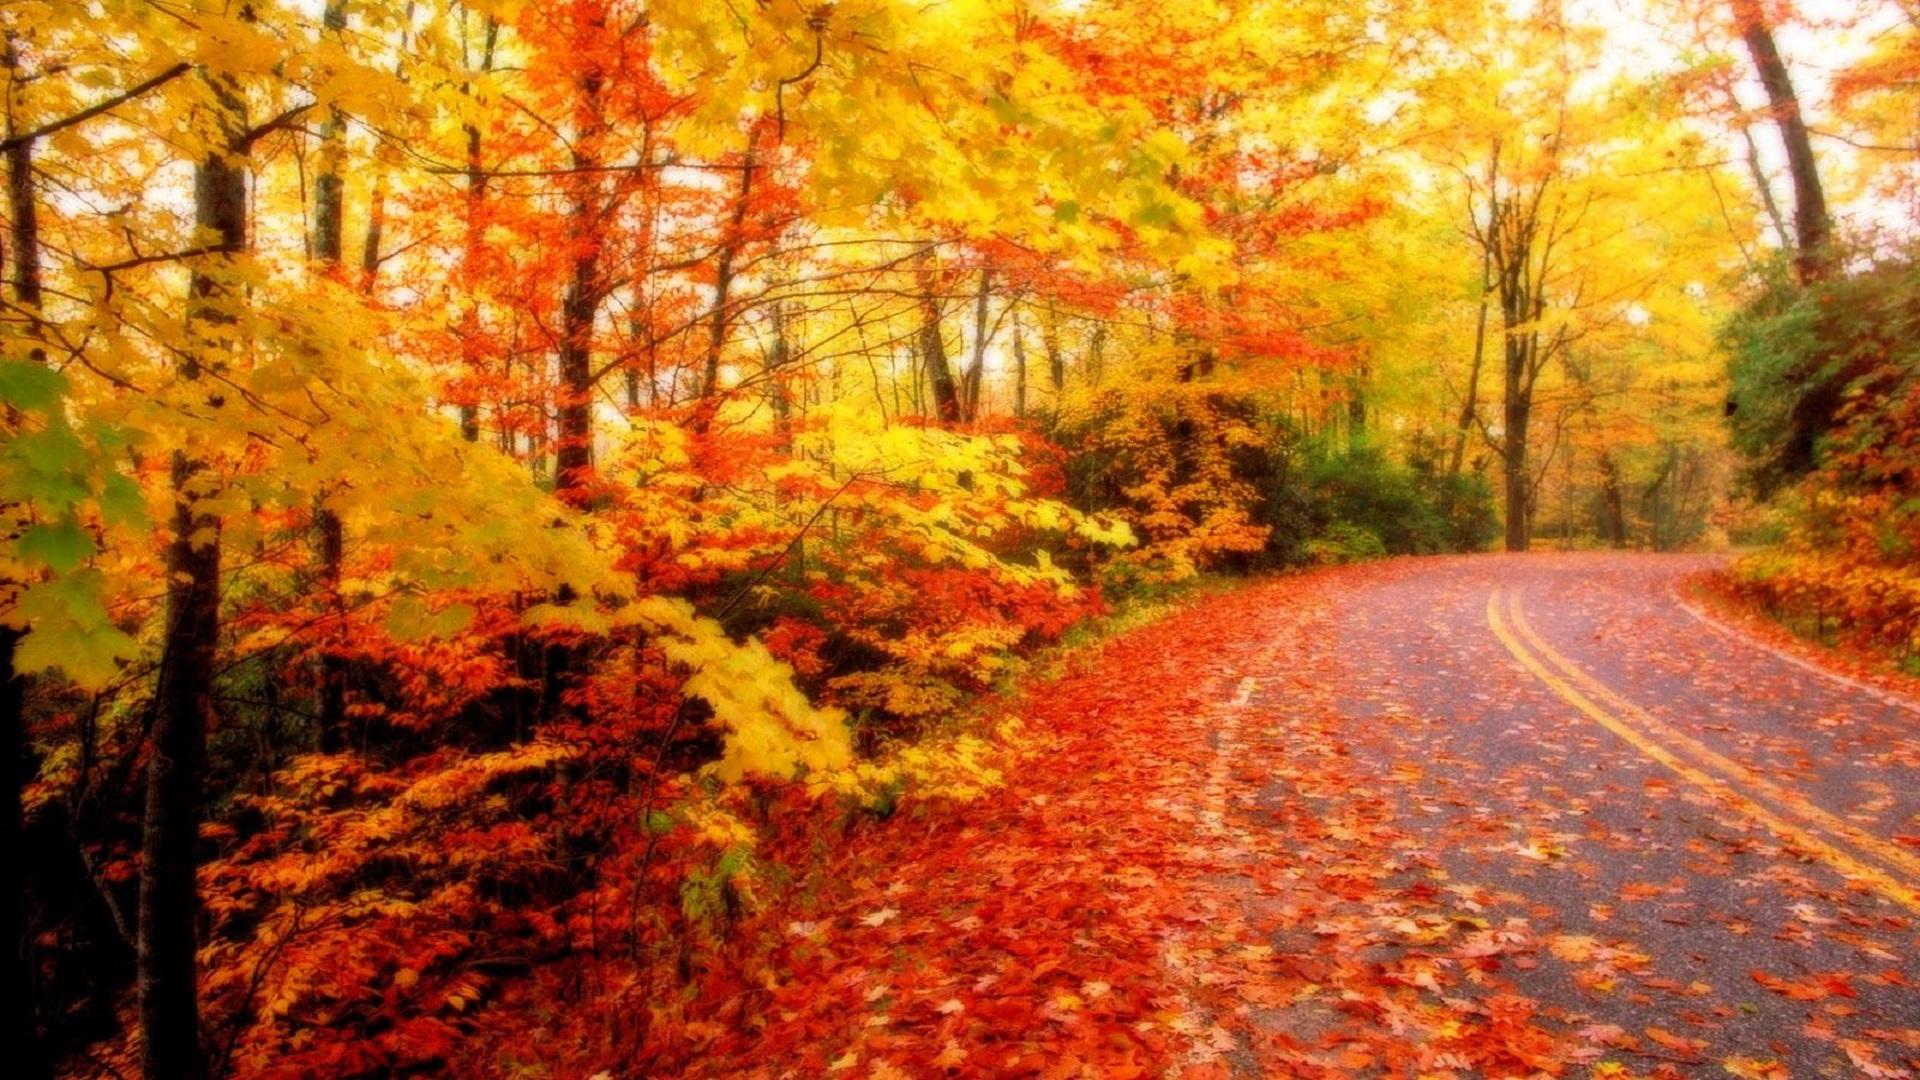 Hd Autumn Season Wallpaper